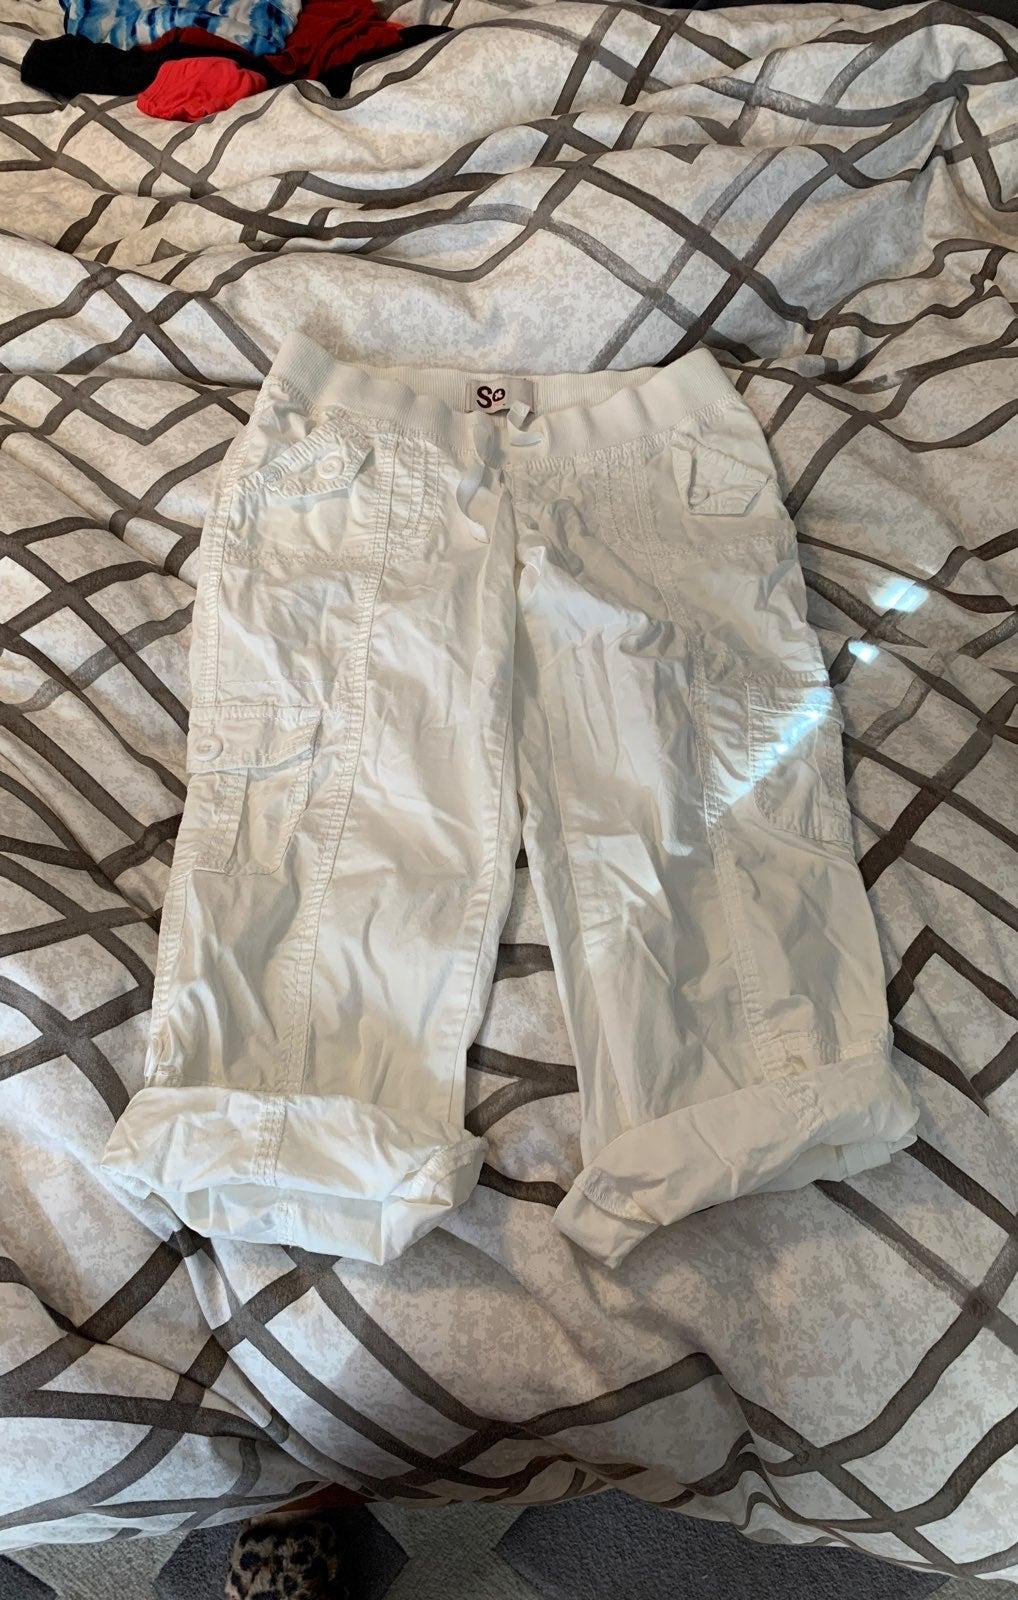 SO whote capri 'cargo' style pants